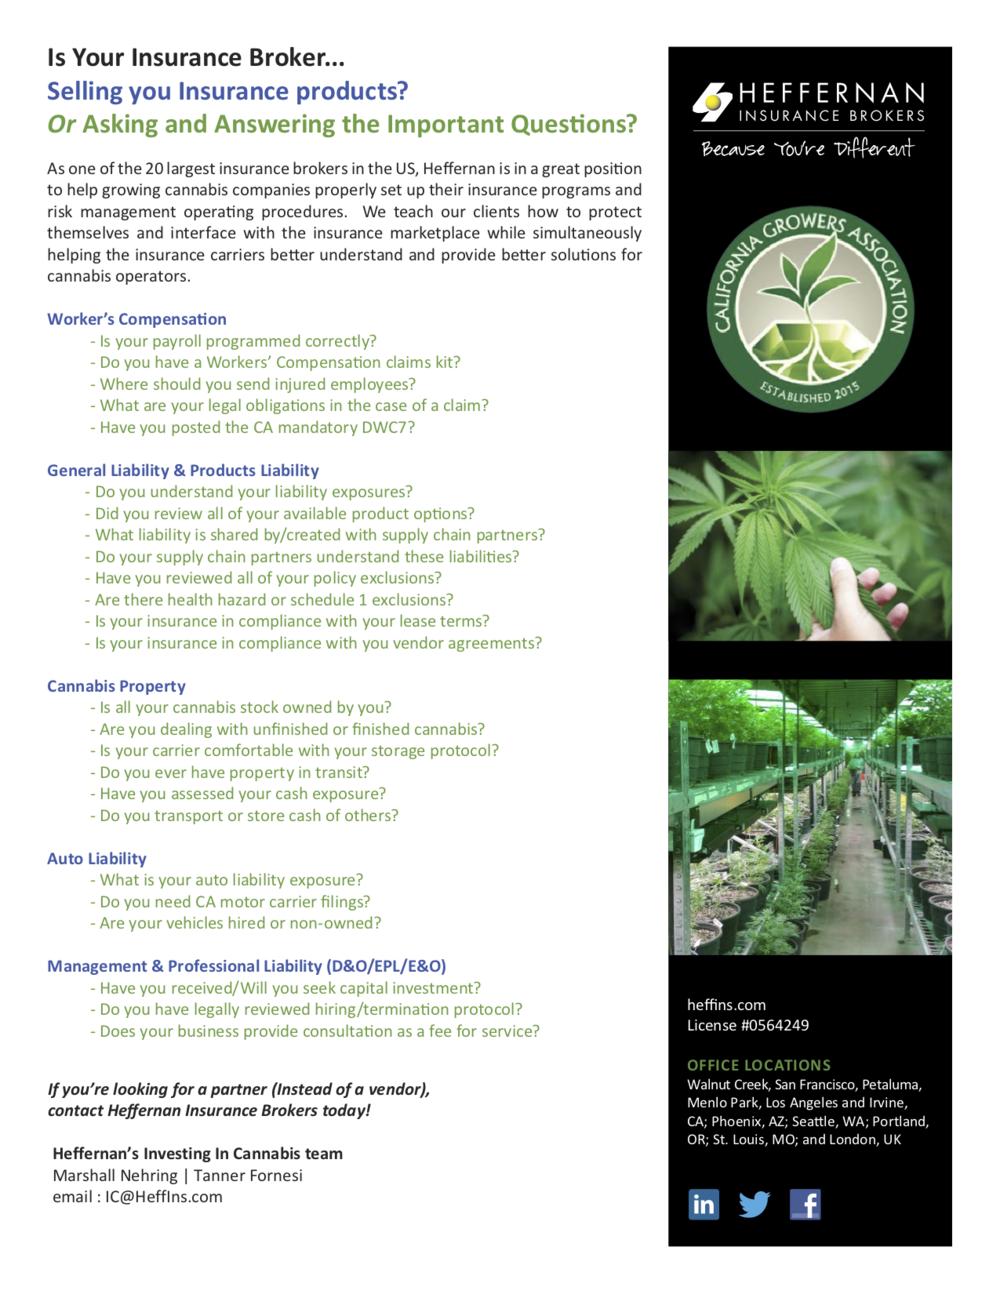 HIB_Cannabis 1 Pager_V4.5.png